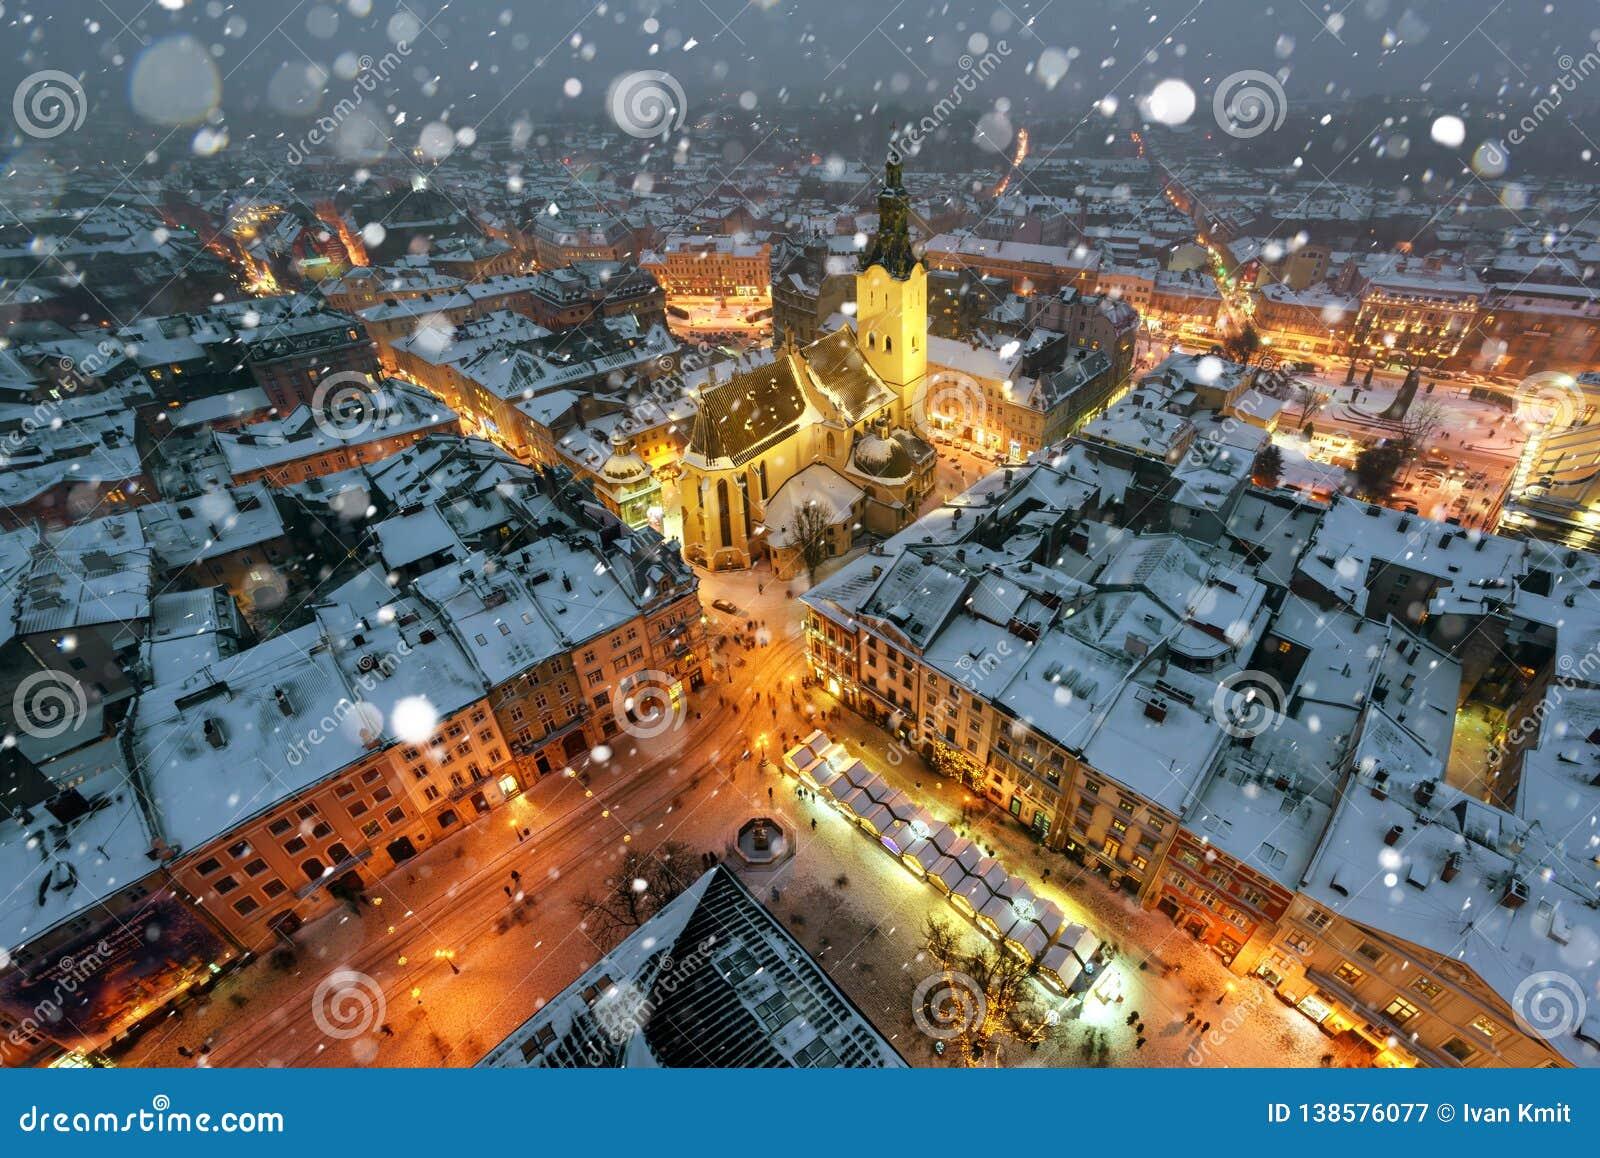 Schilderachtige avondmening over Lviv-stadscentrum vanaf bovenkant van stadhuis